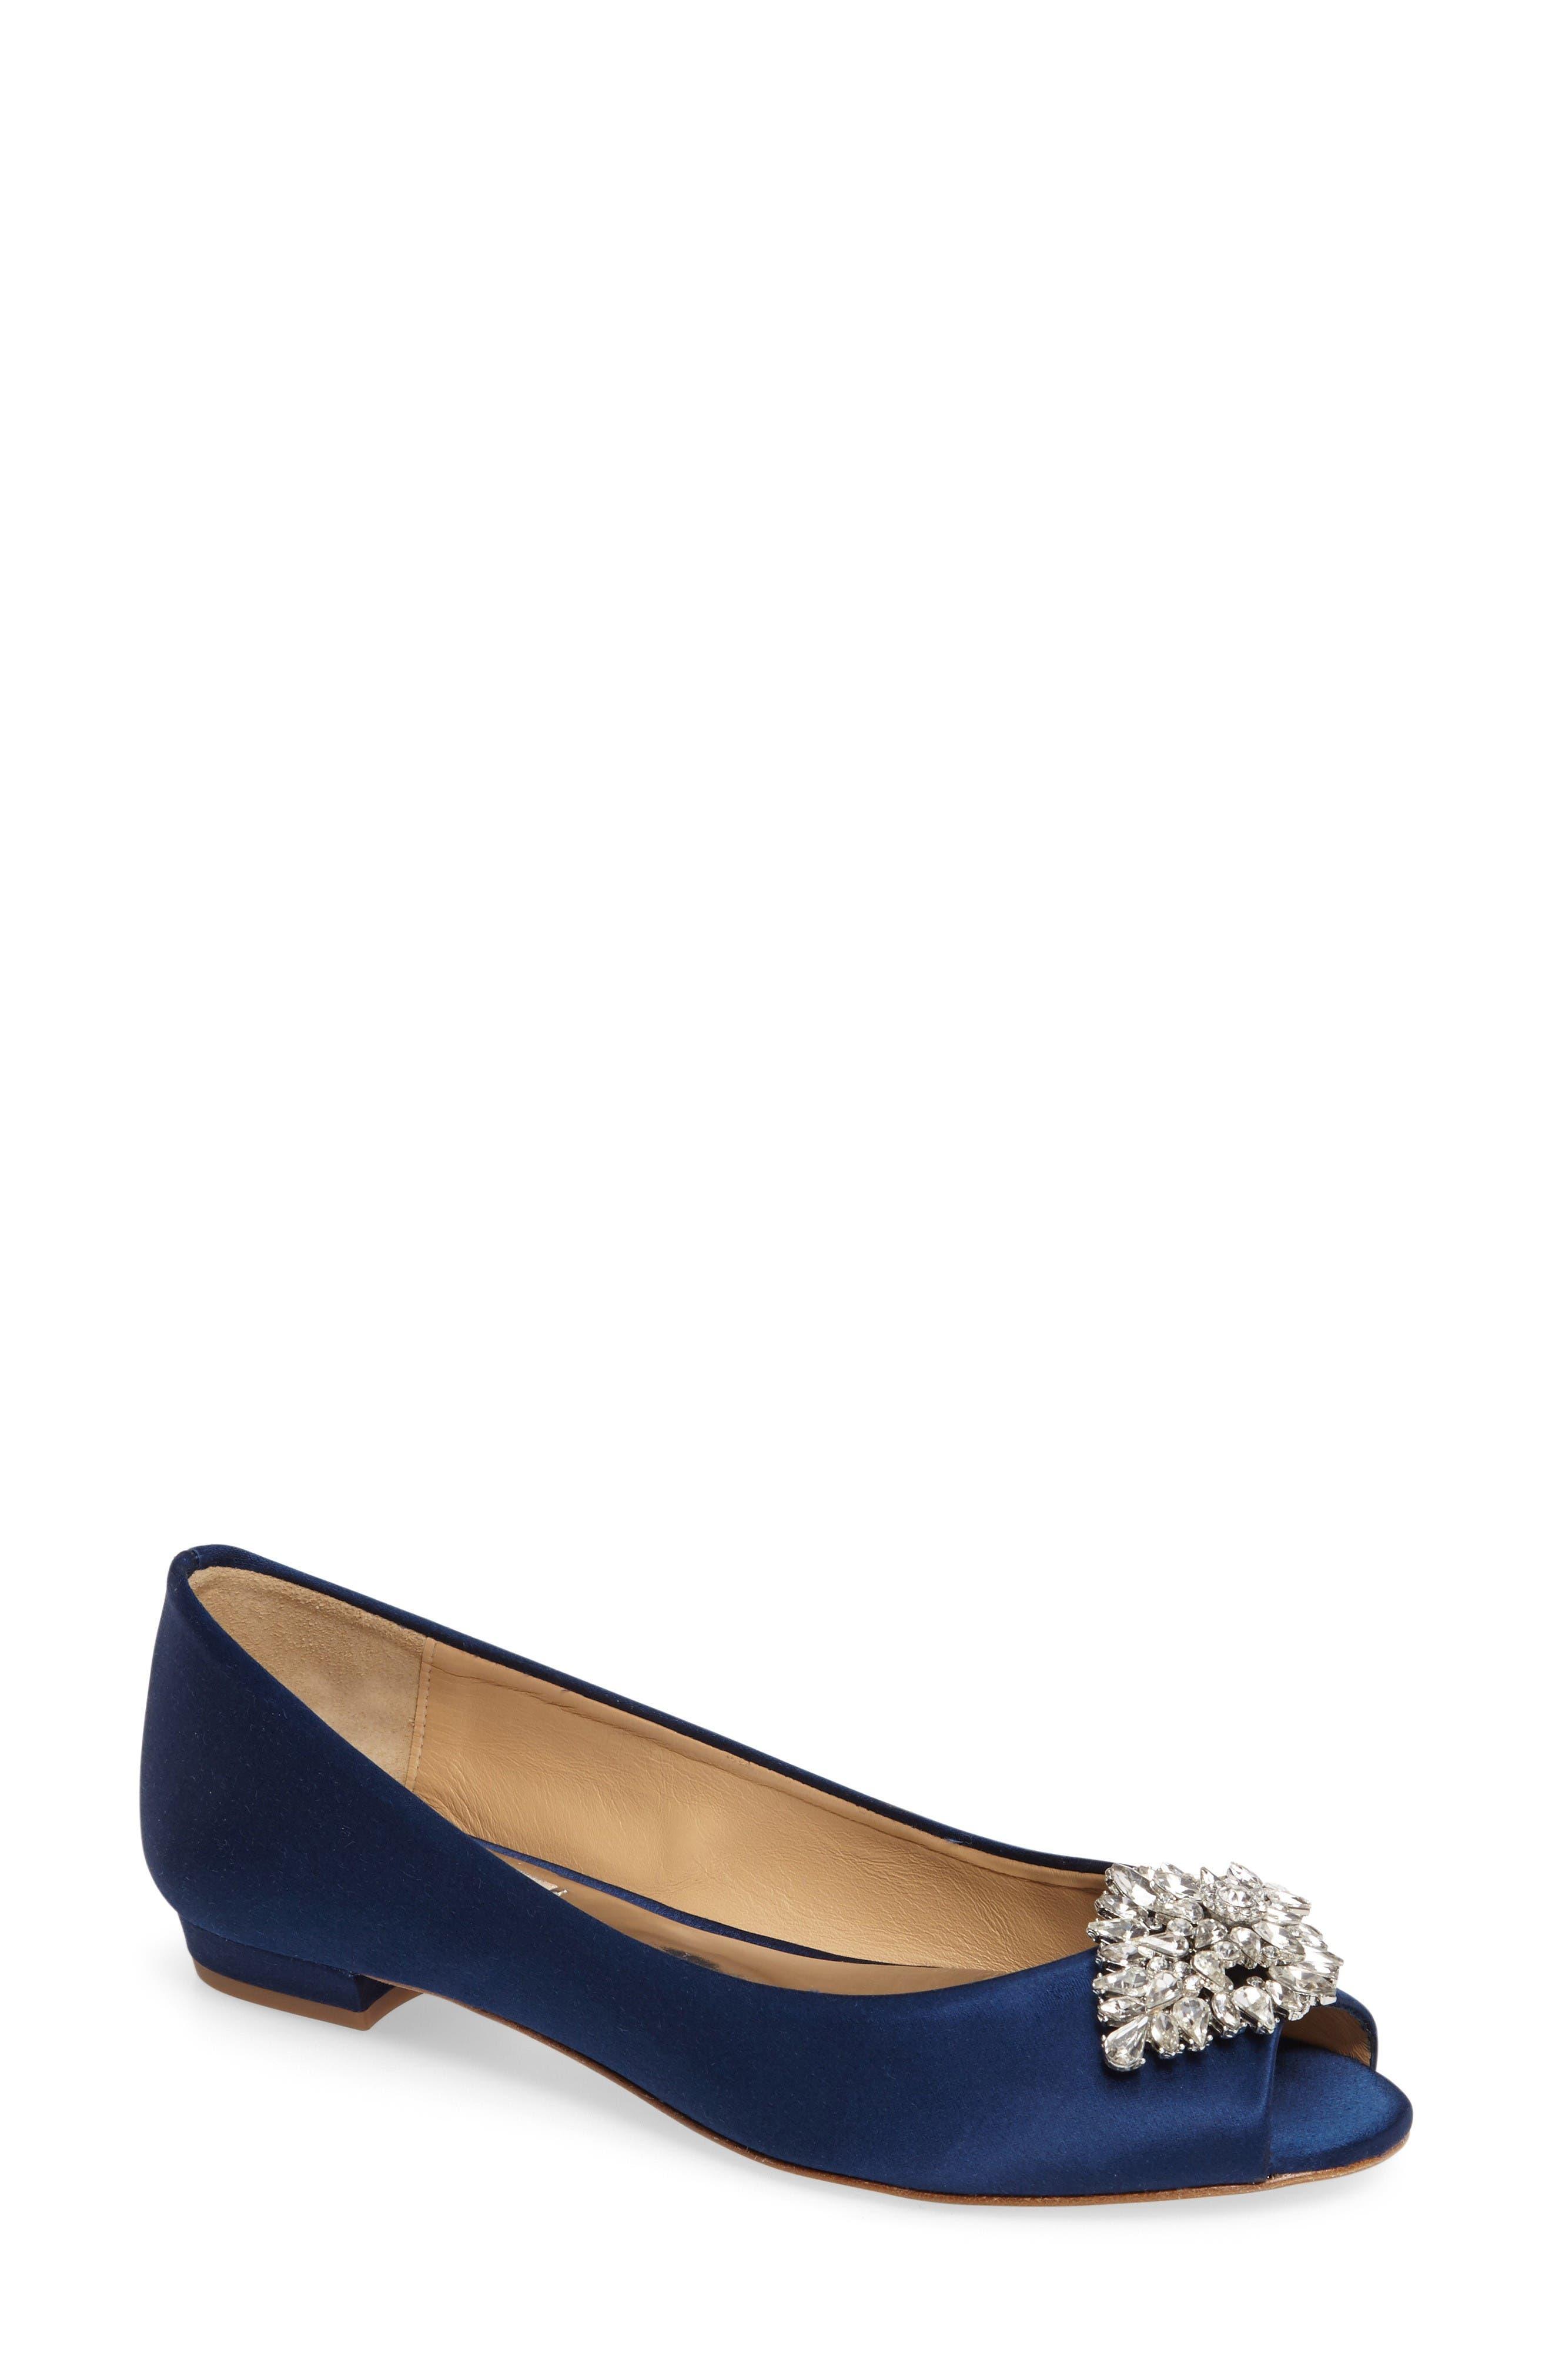 Badgley Mischka Taft Peep Toe Flat (Women)